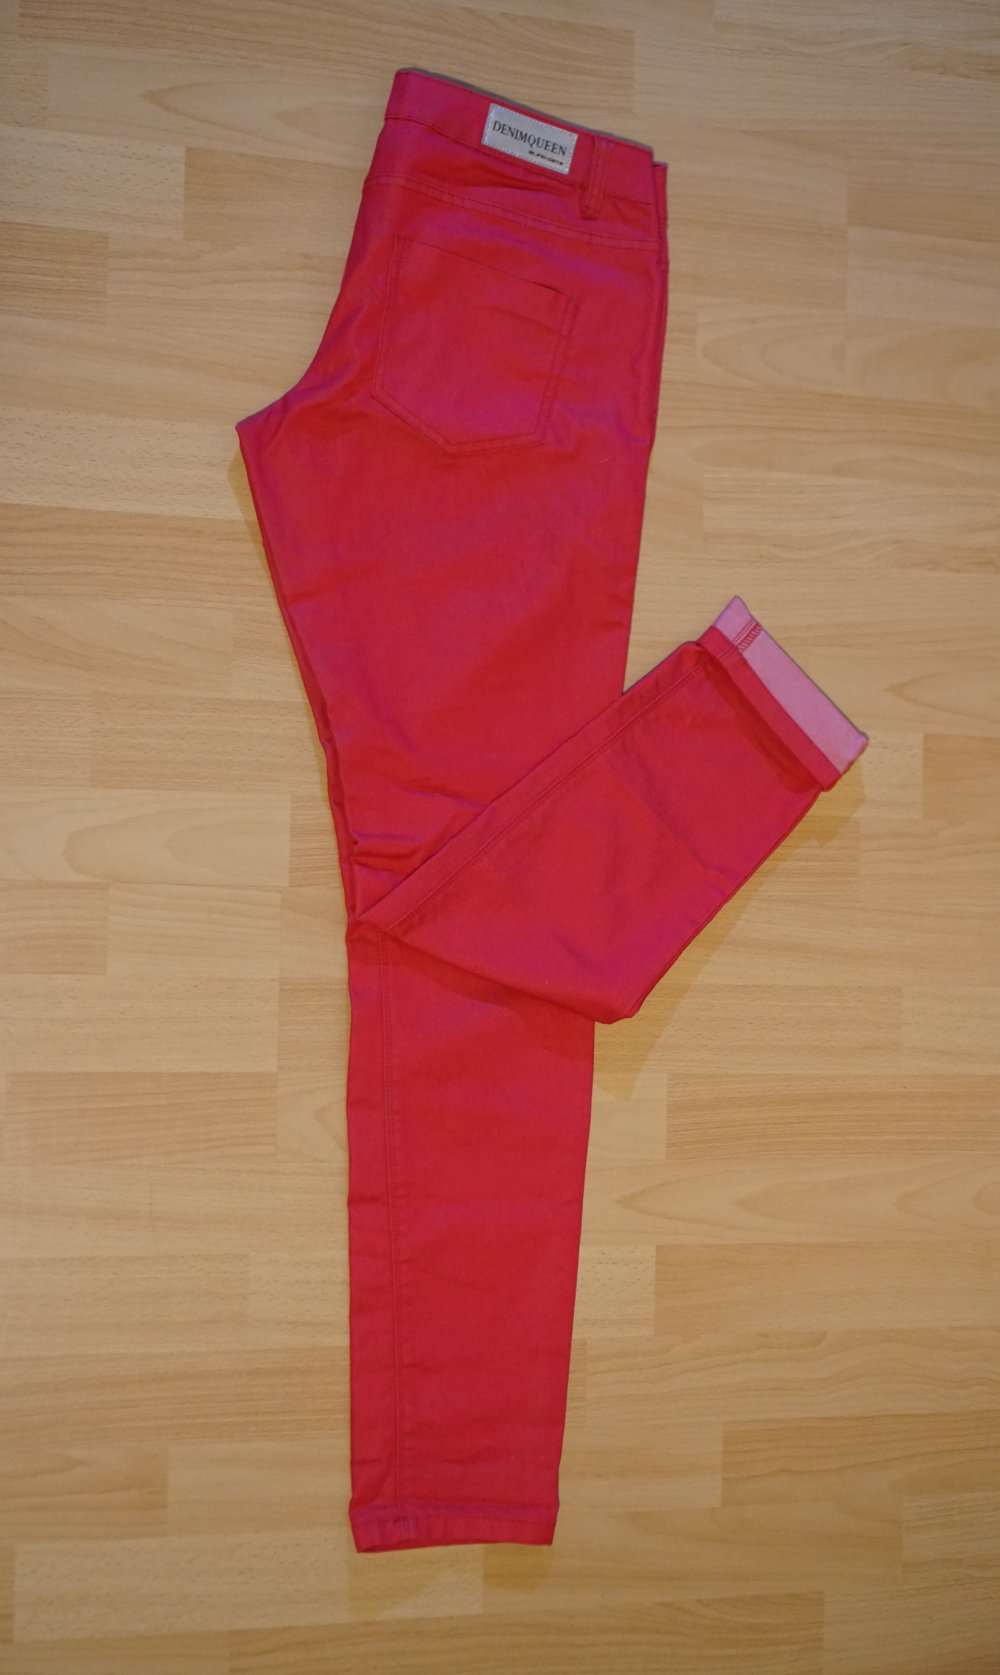 e89b1995512b9 BLIND DATE pinke Jeans-Hose Gr.: W32/L32